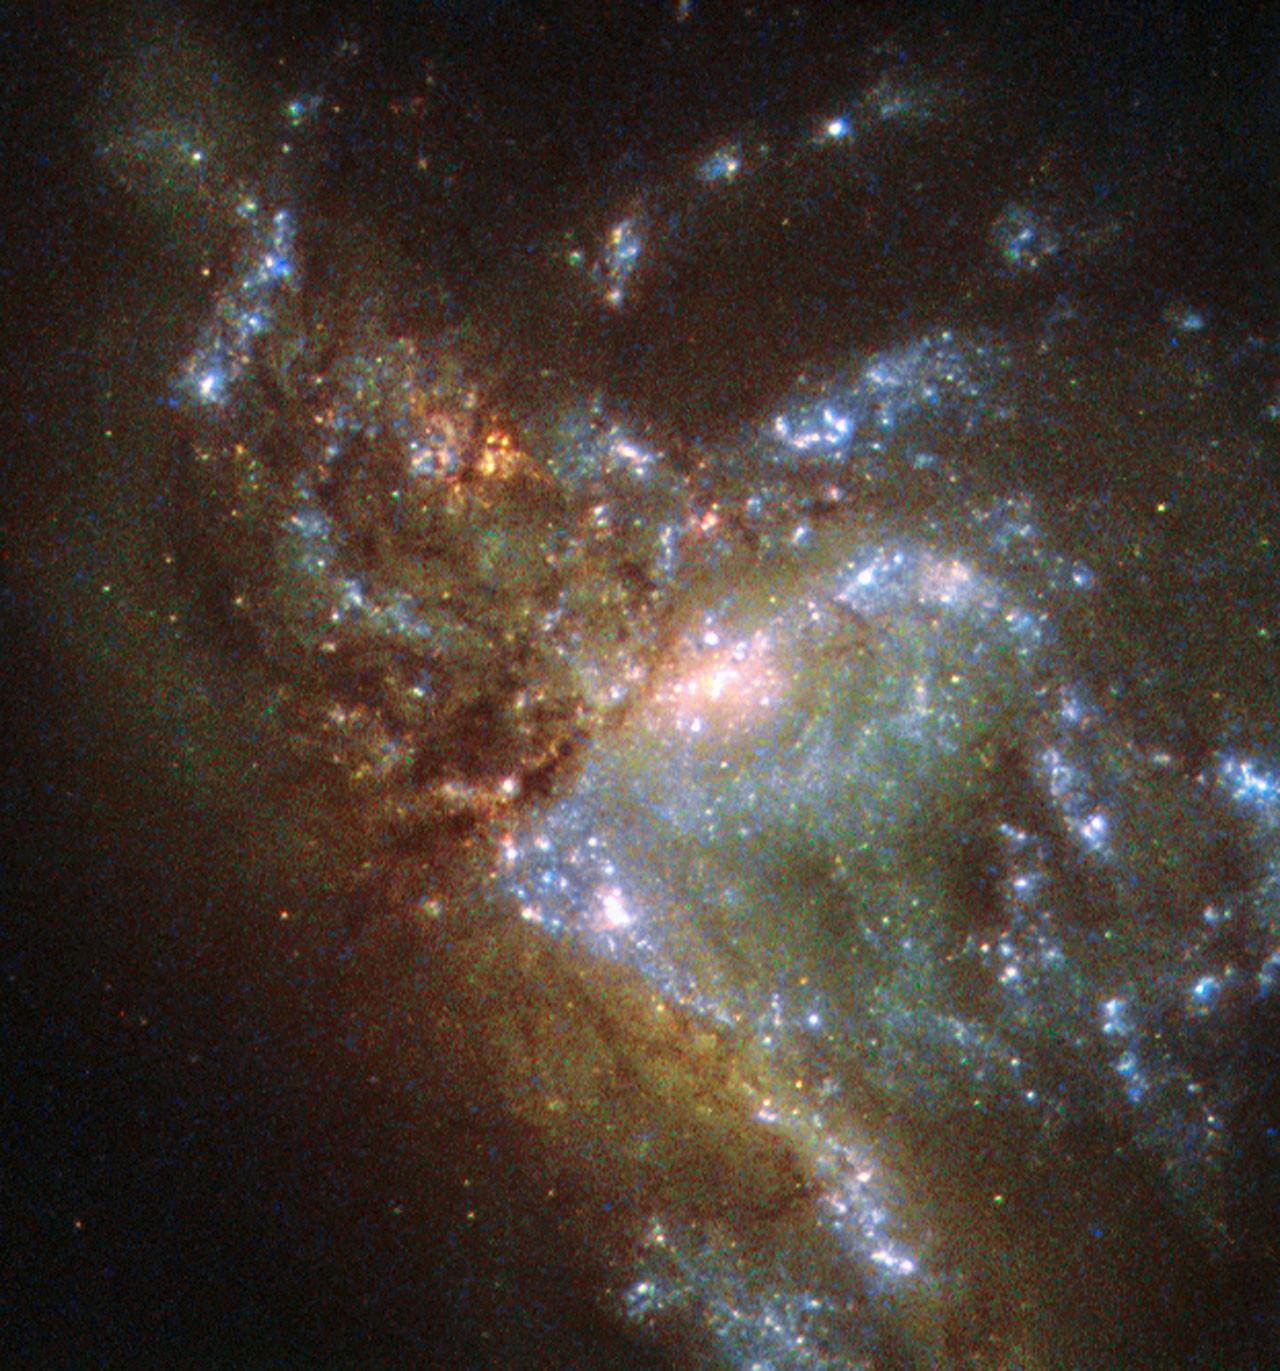 NGC 6502 in the constellation Hercules. Image credit: ESA/Hubble & NASA, Acknowledgement: Judy Schmidt.